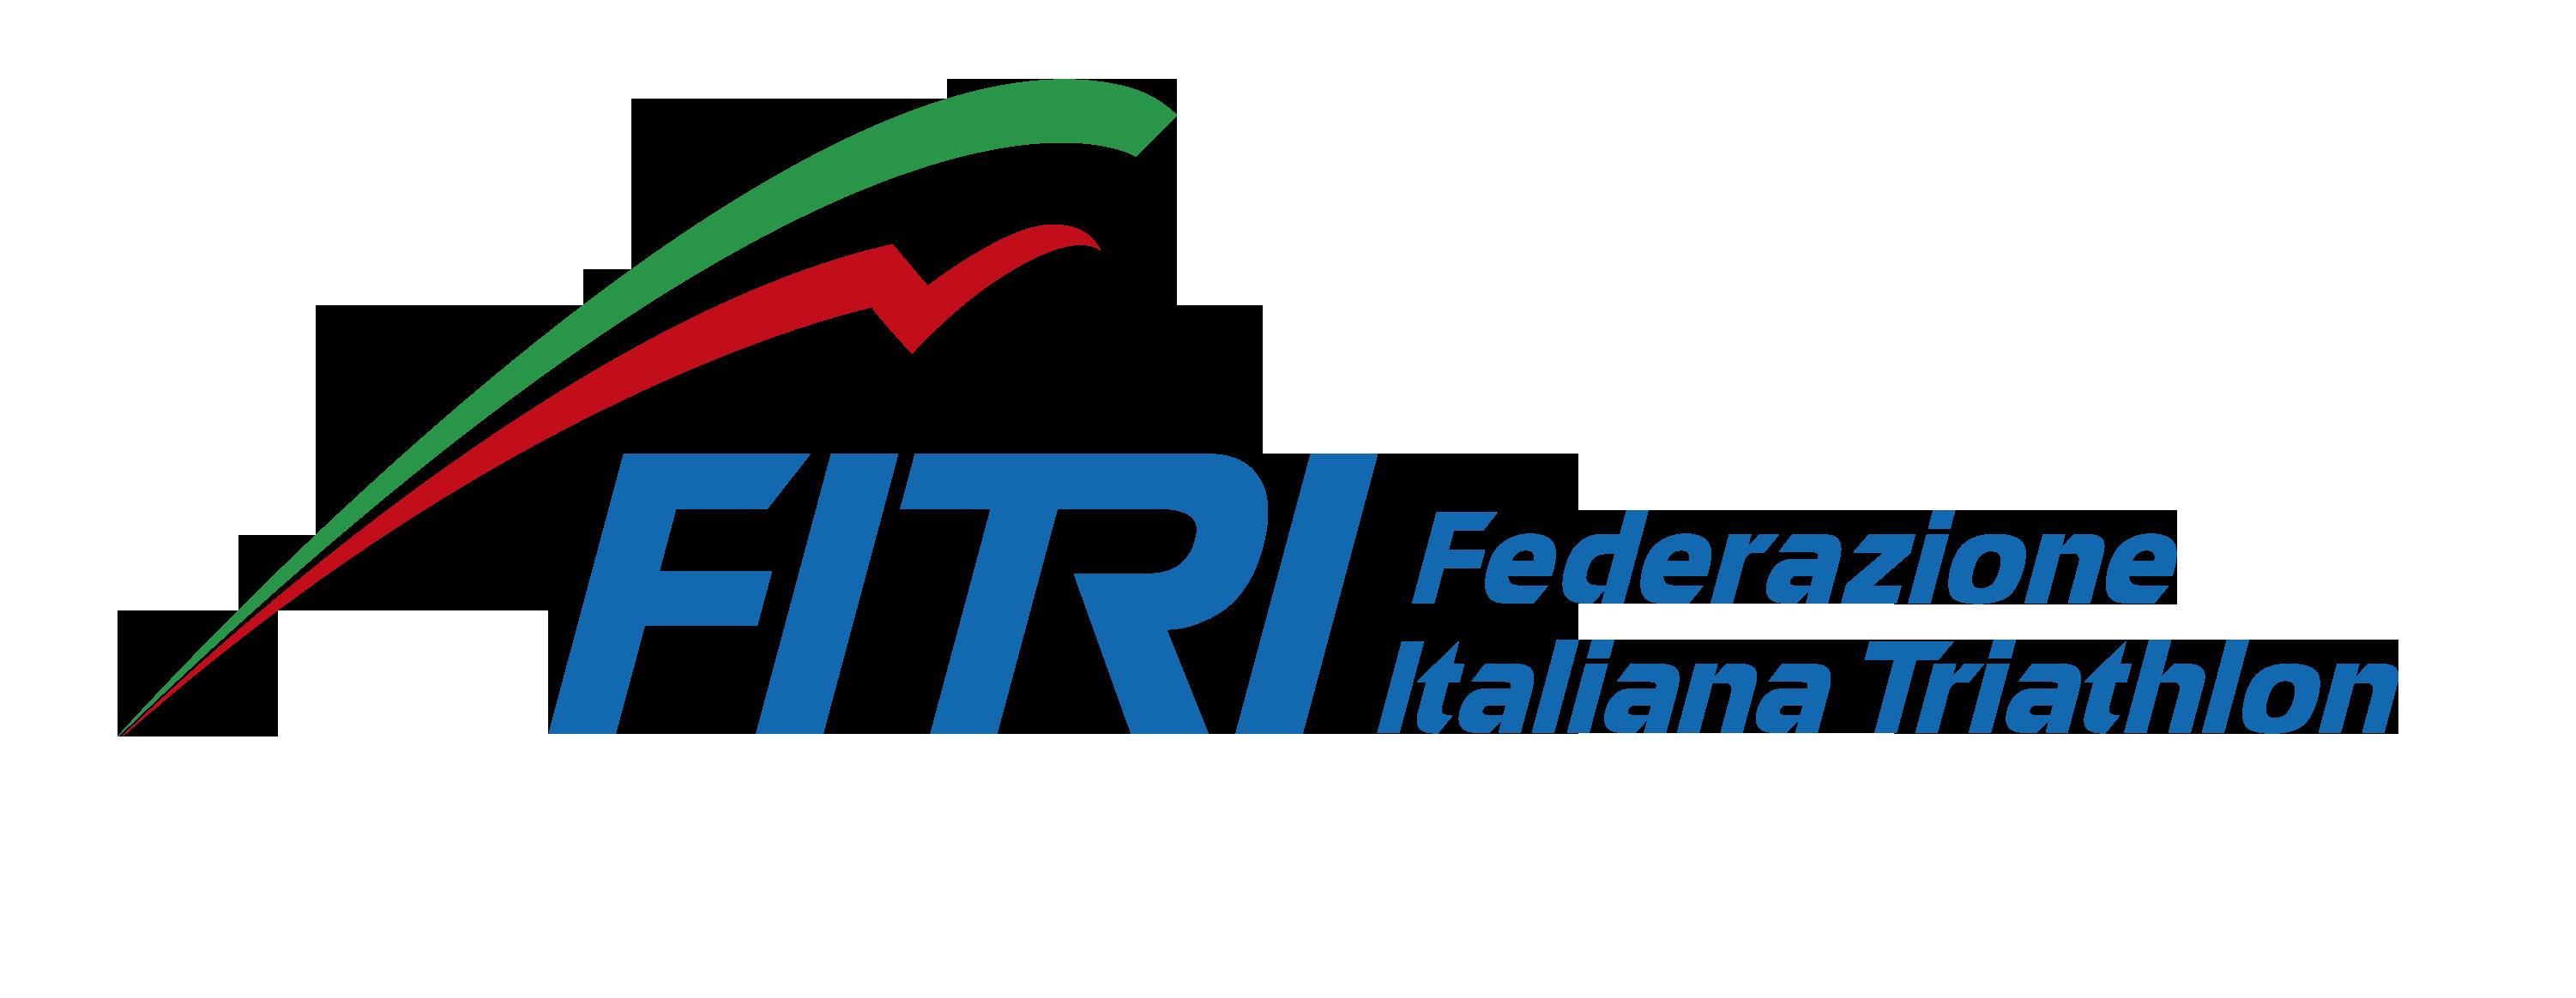 Federazione Italiana Triathlon logo